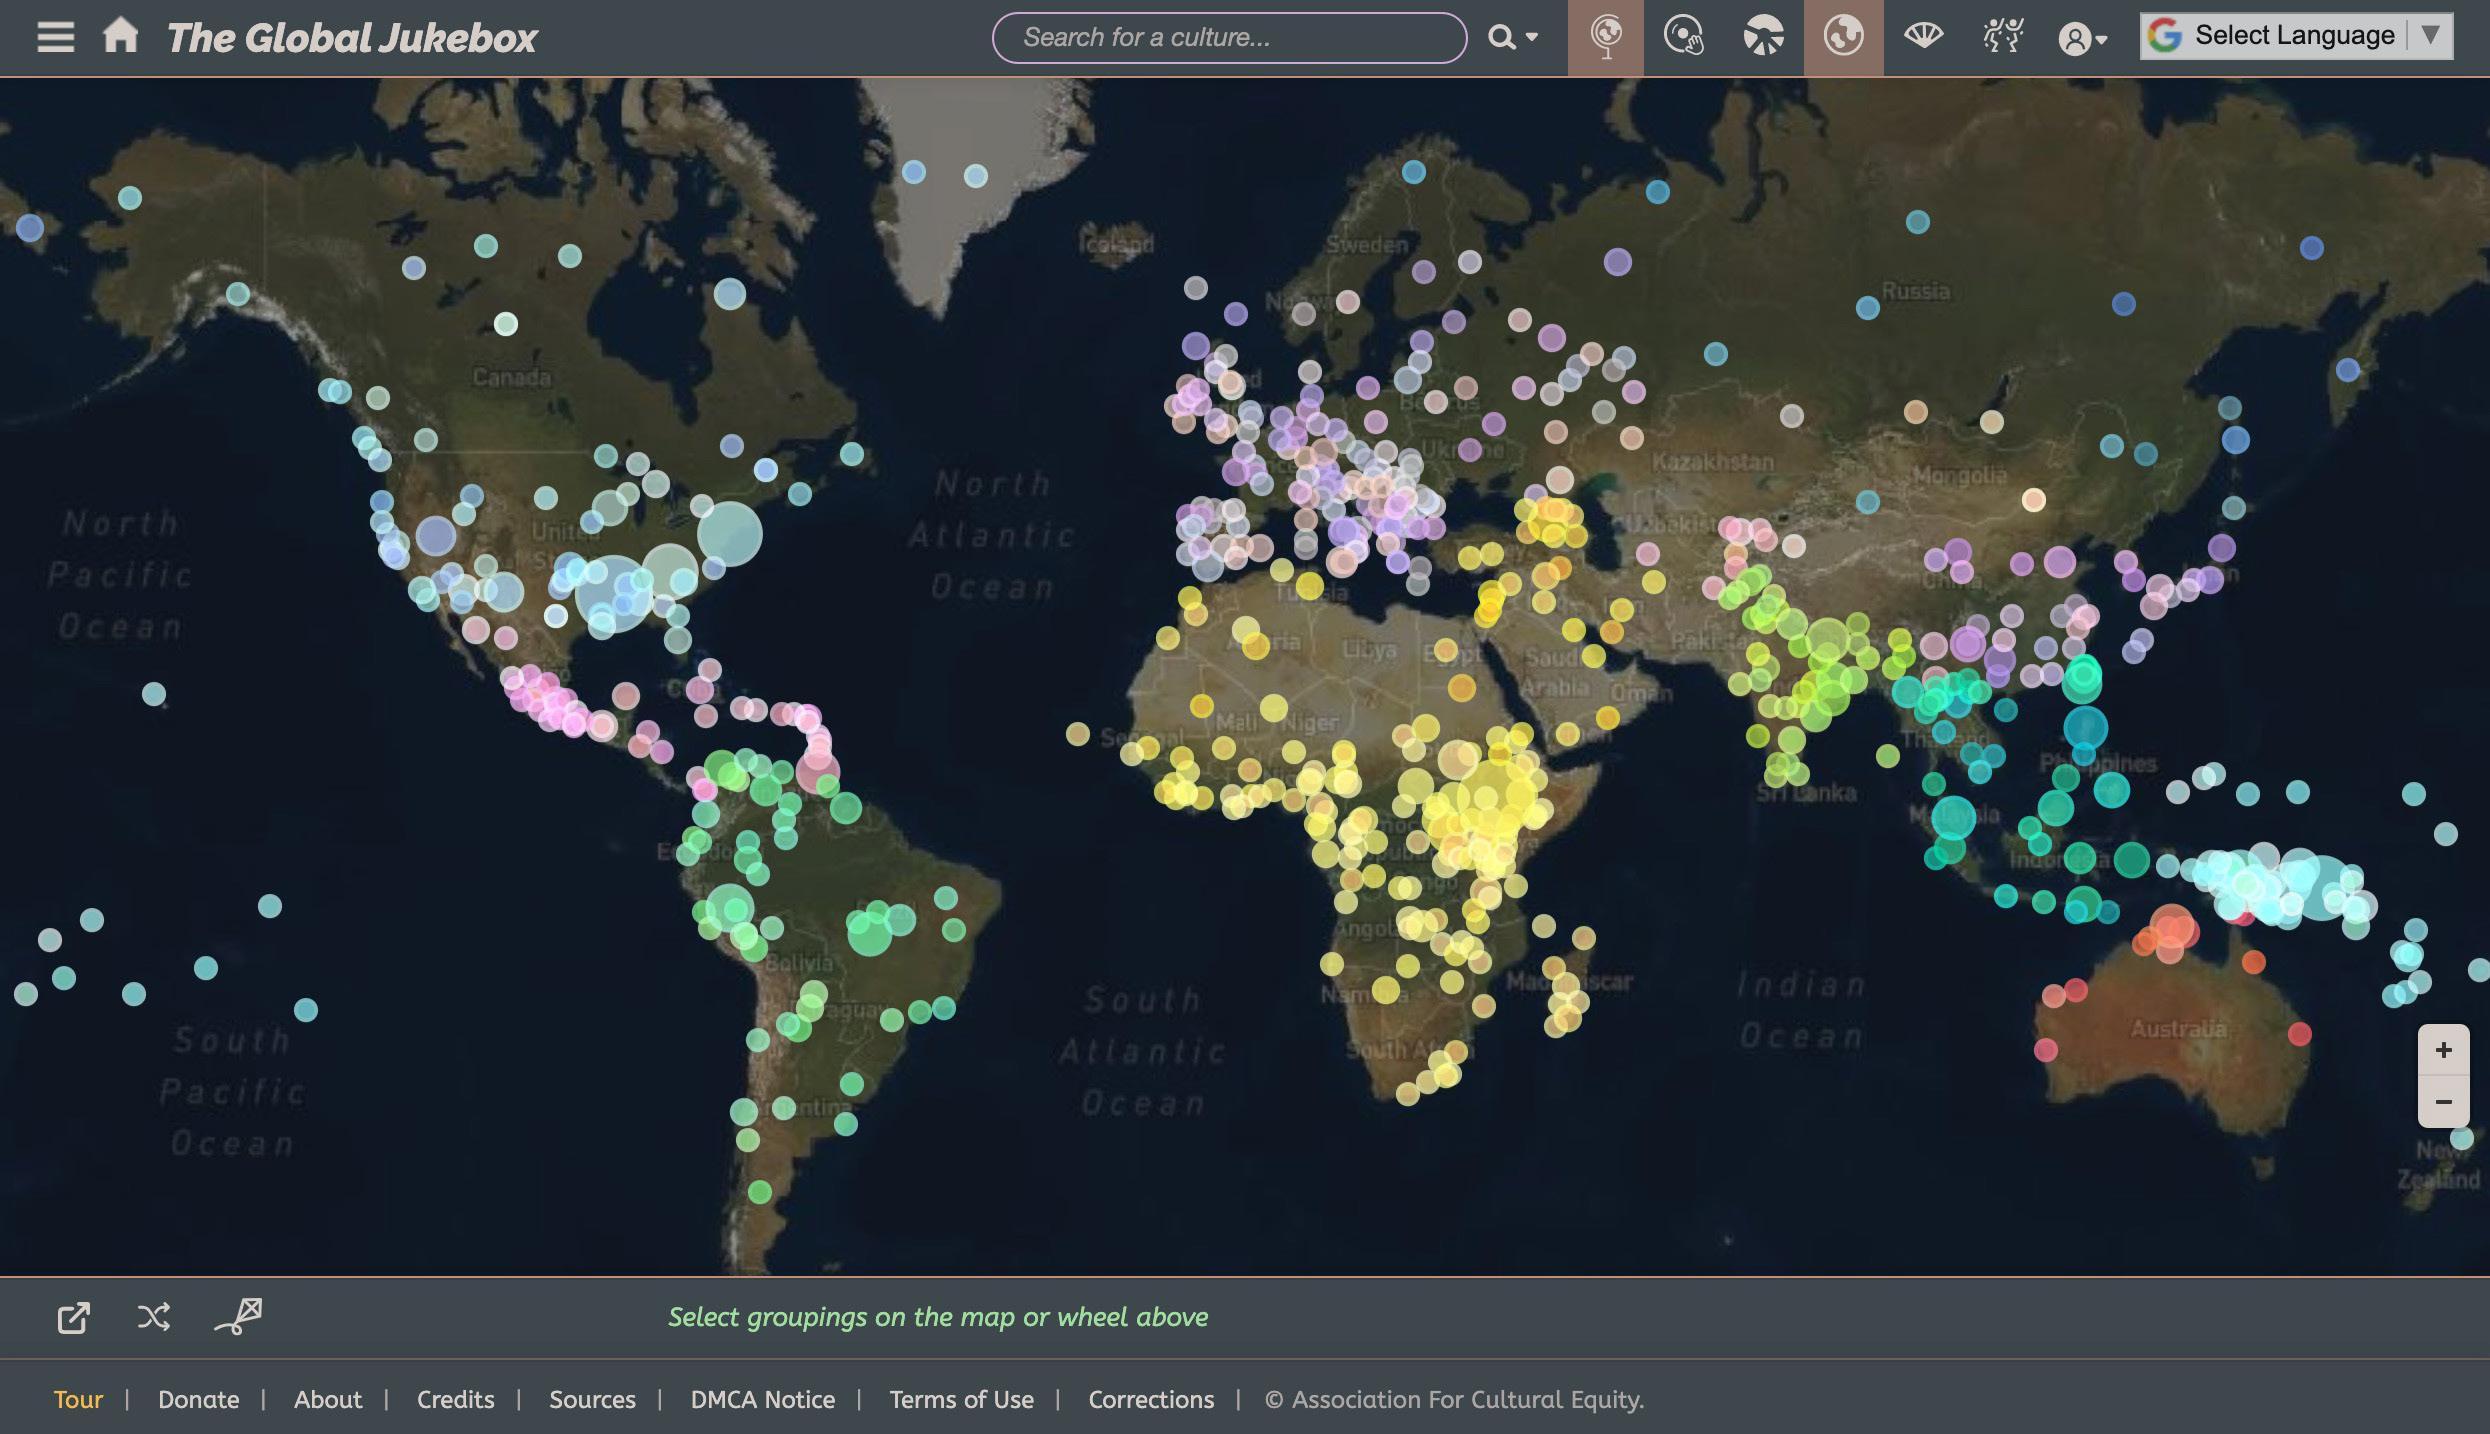 FIGURE 3. Screenshot of the interactive map in The Global Jukebox website